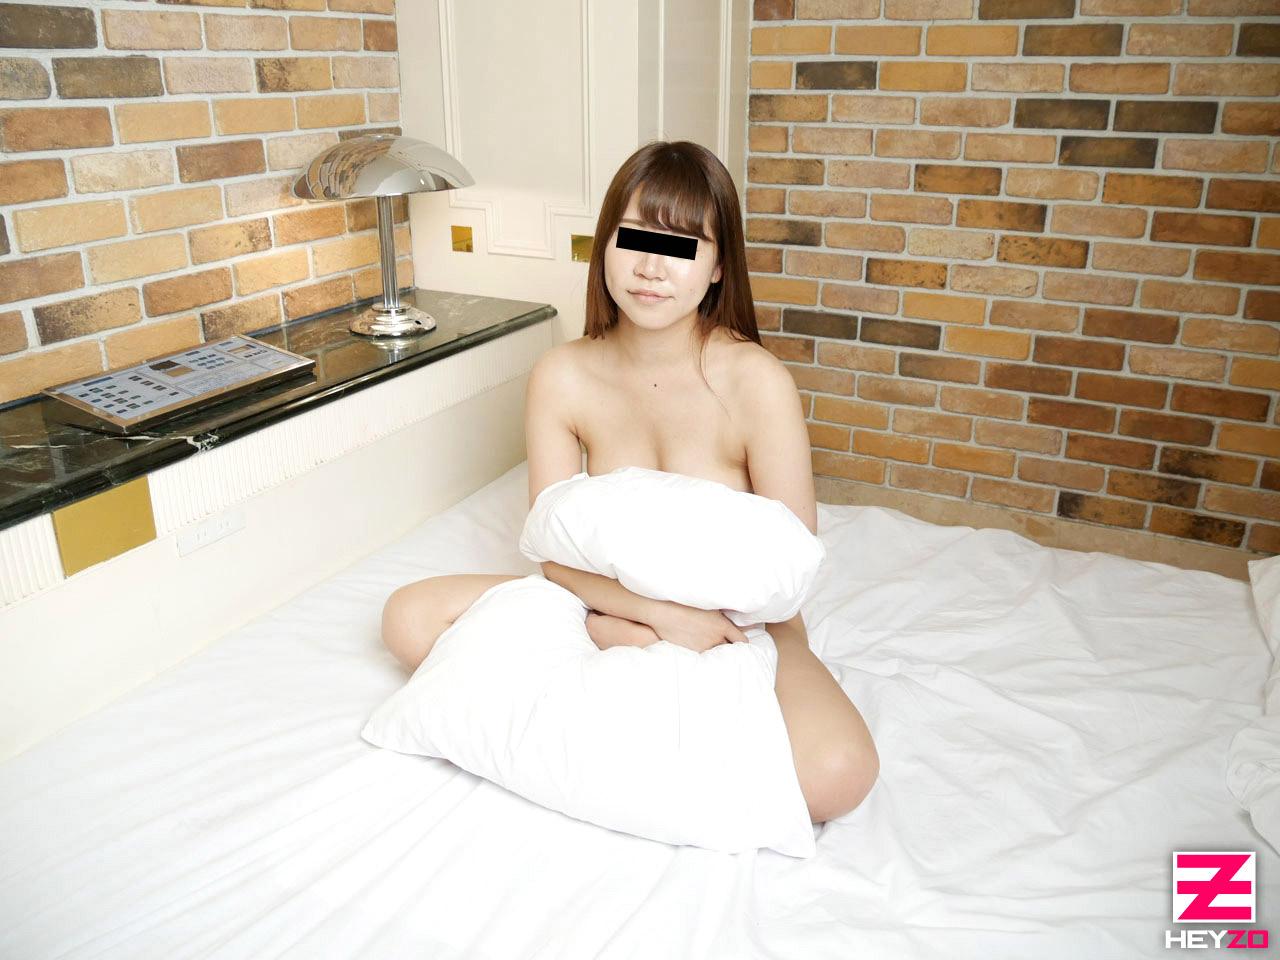 [Yu Nagata、永田ゆう]编号:NO.28245高清写真作品图片-2010-07-17上架